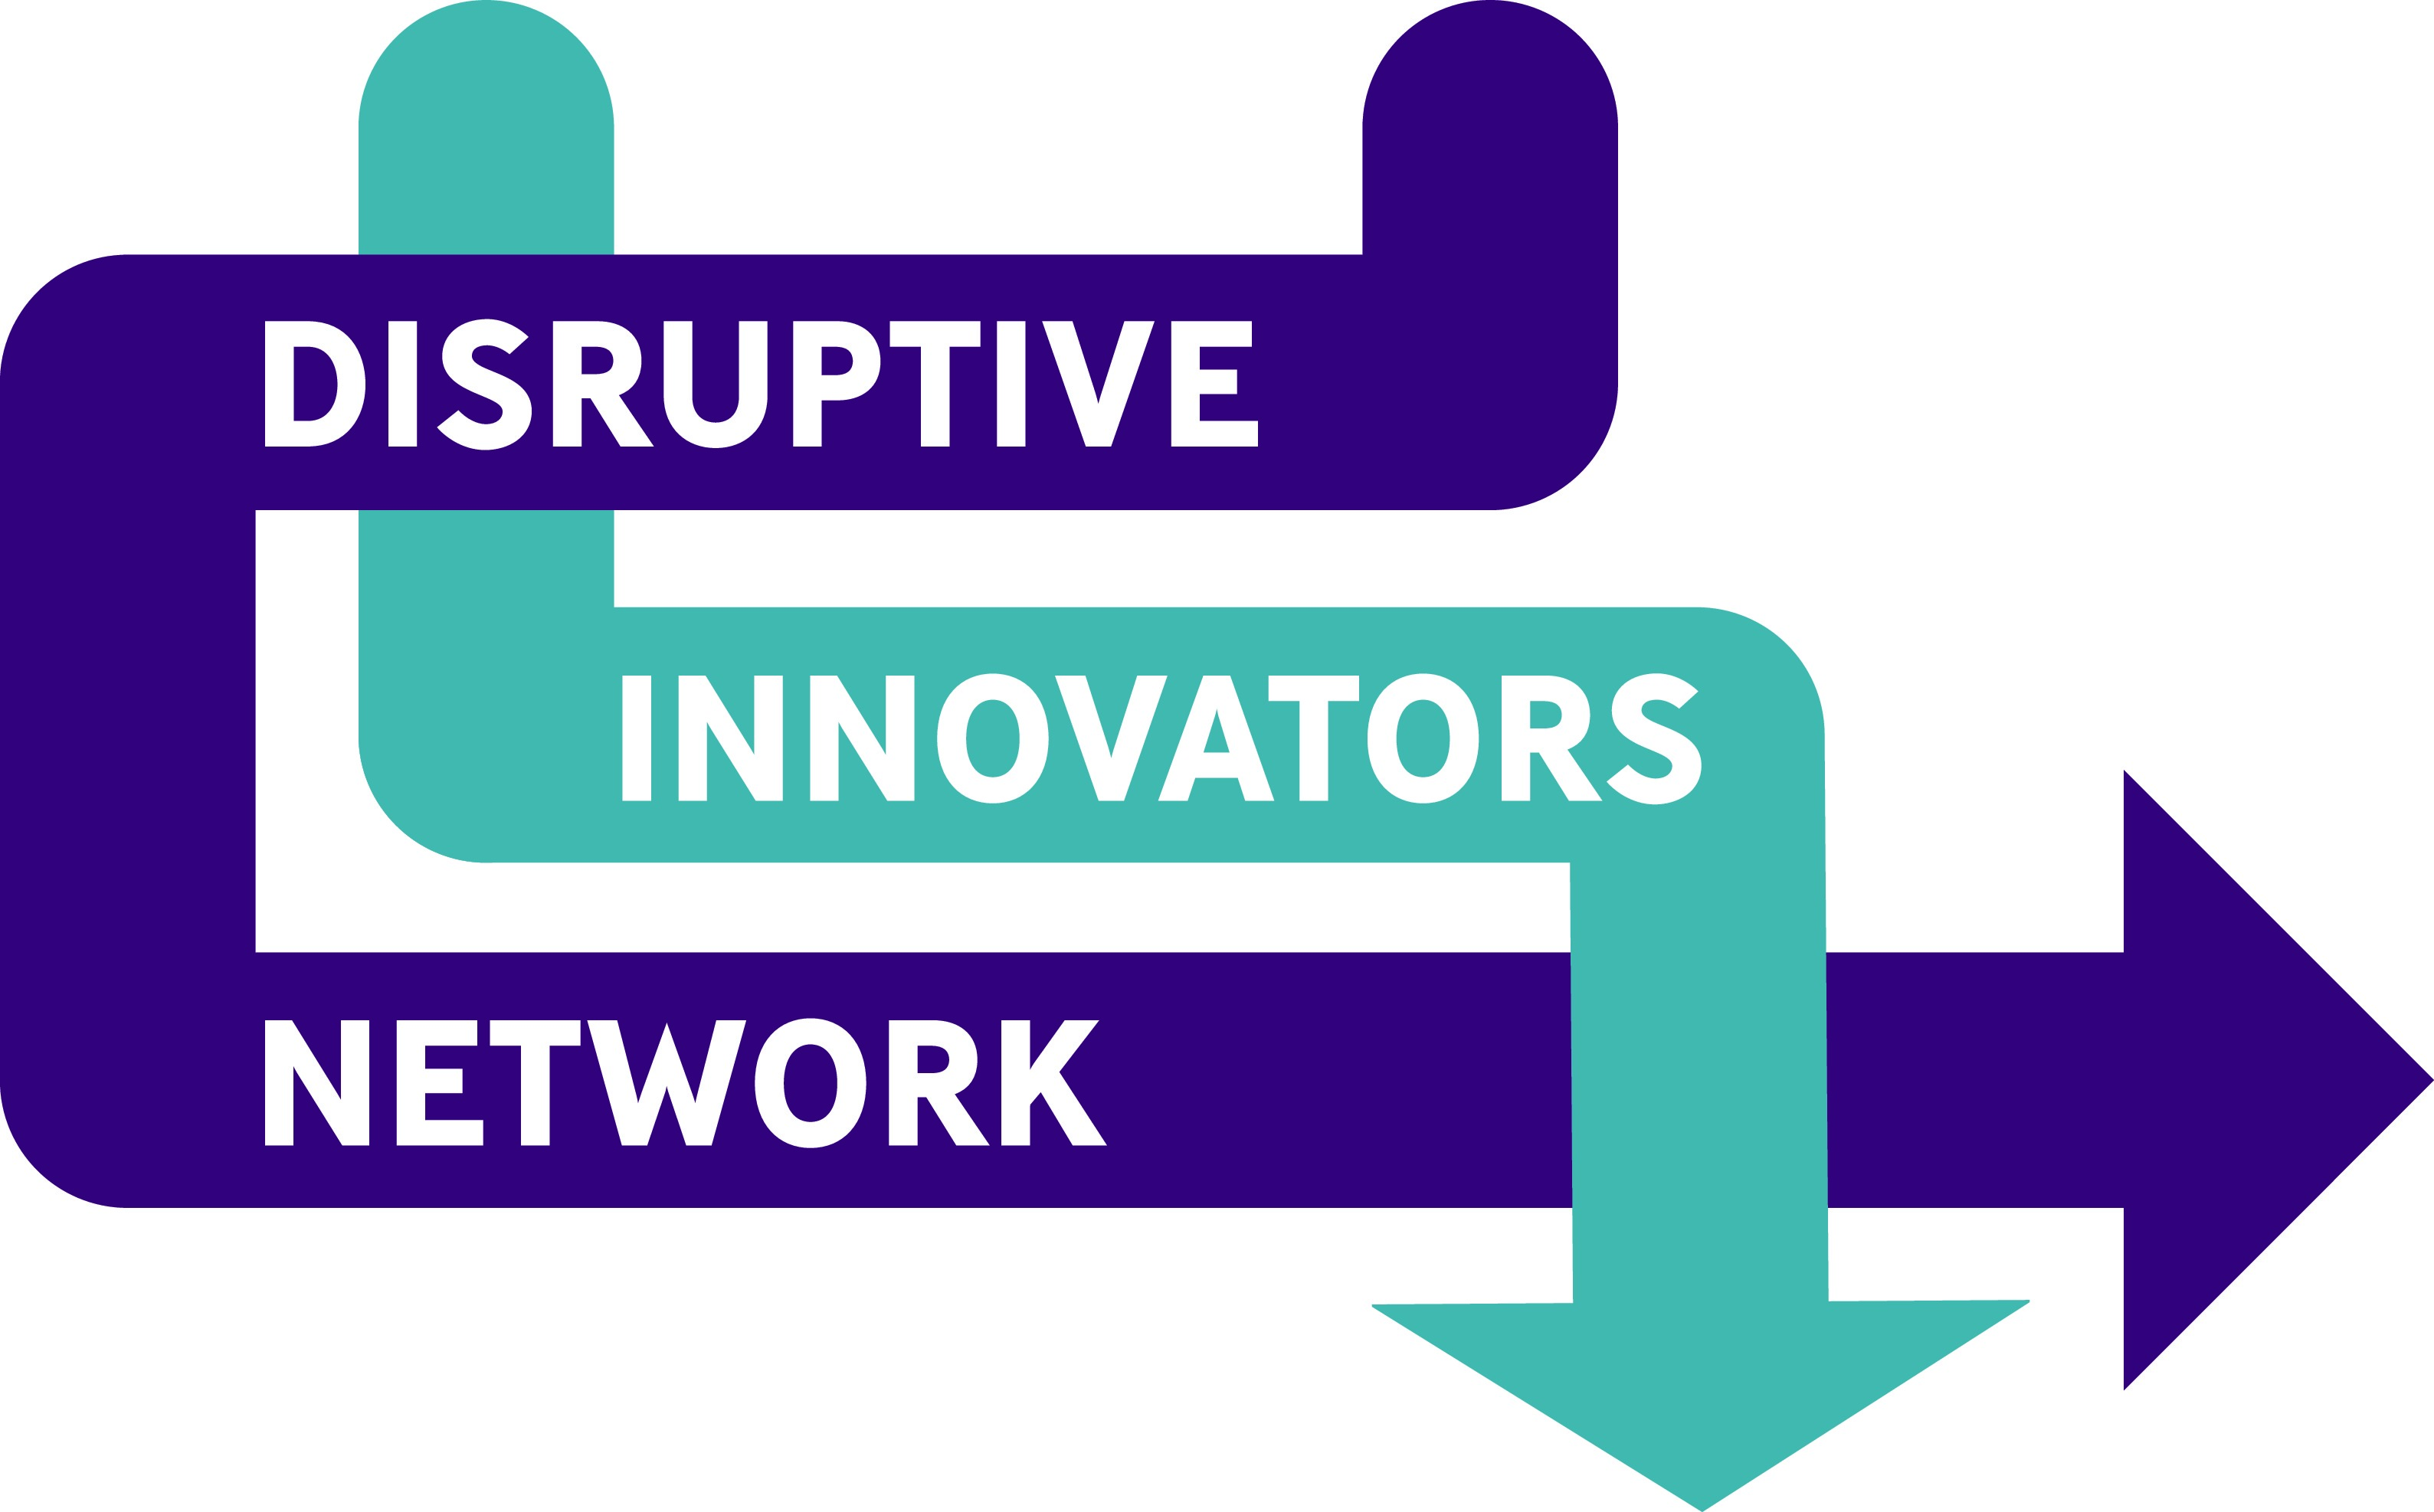 Disruptive Innovators Network